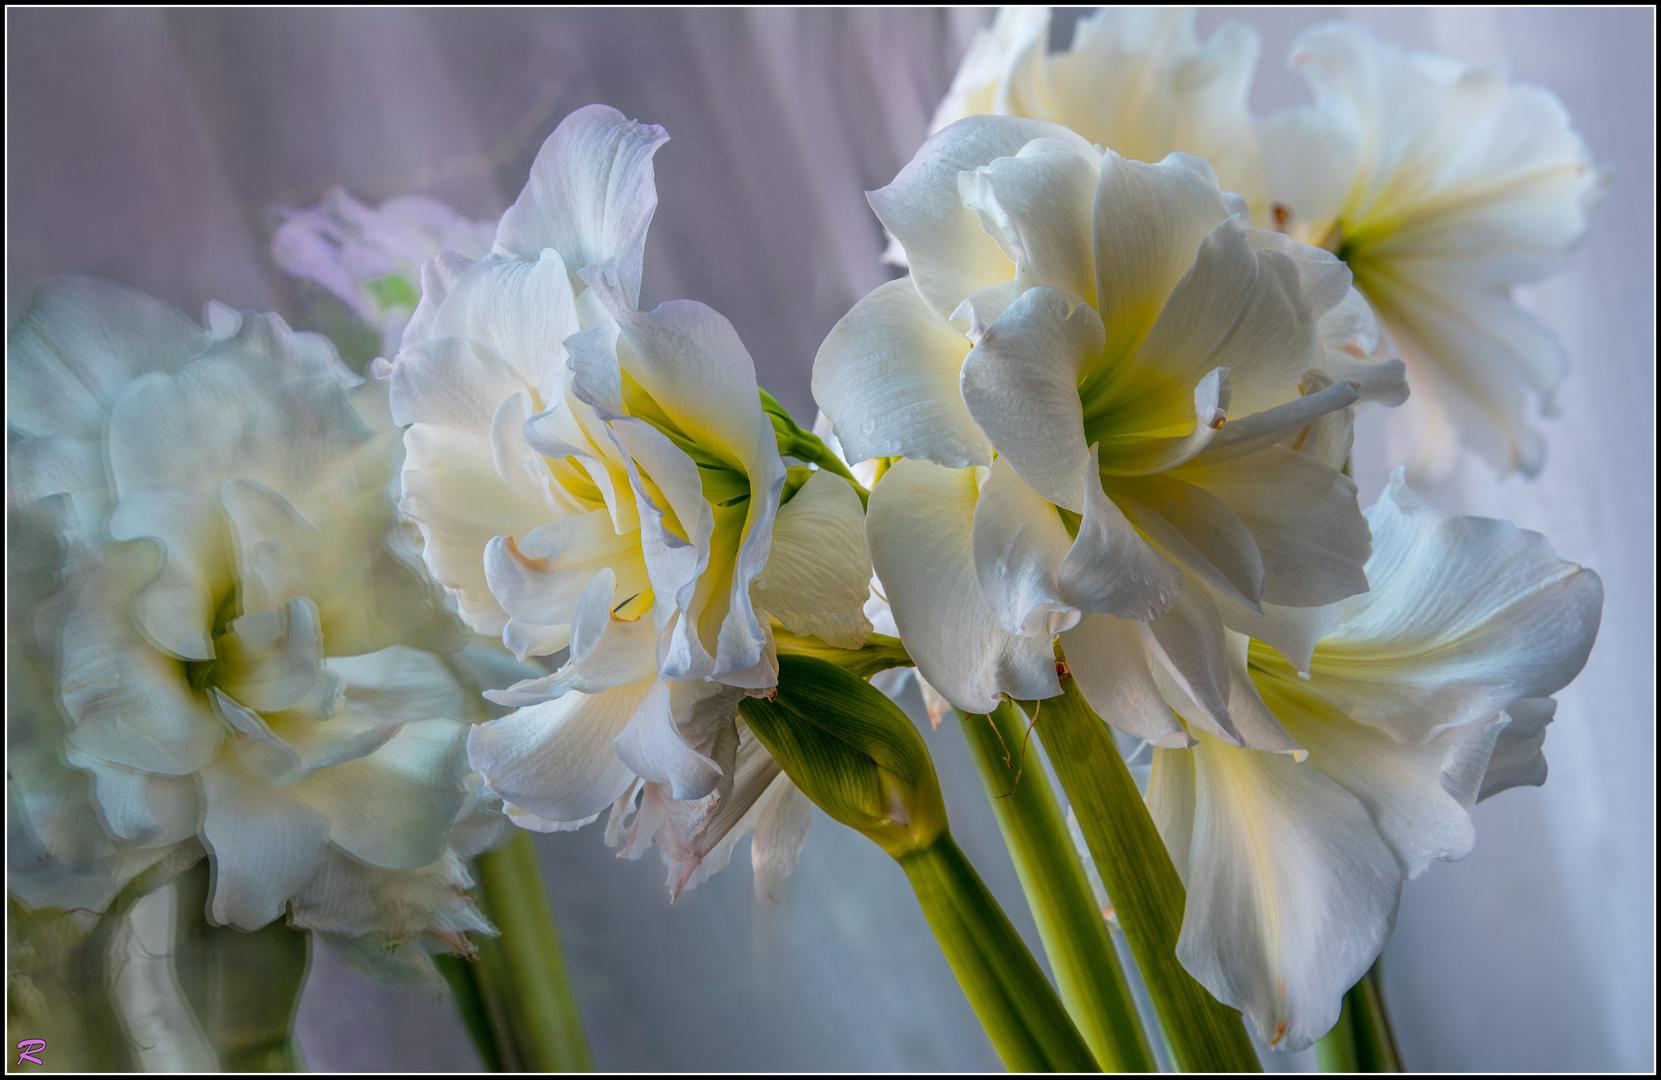 erstes Licht des Frühlings ...